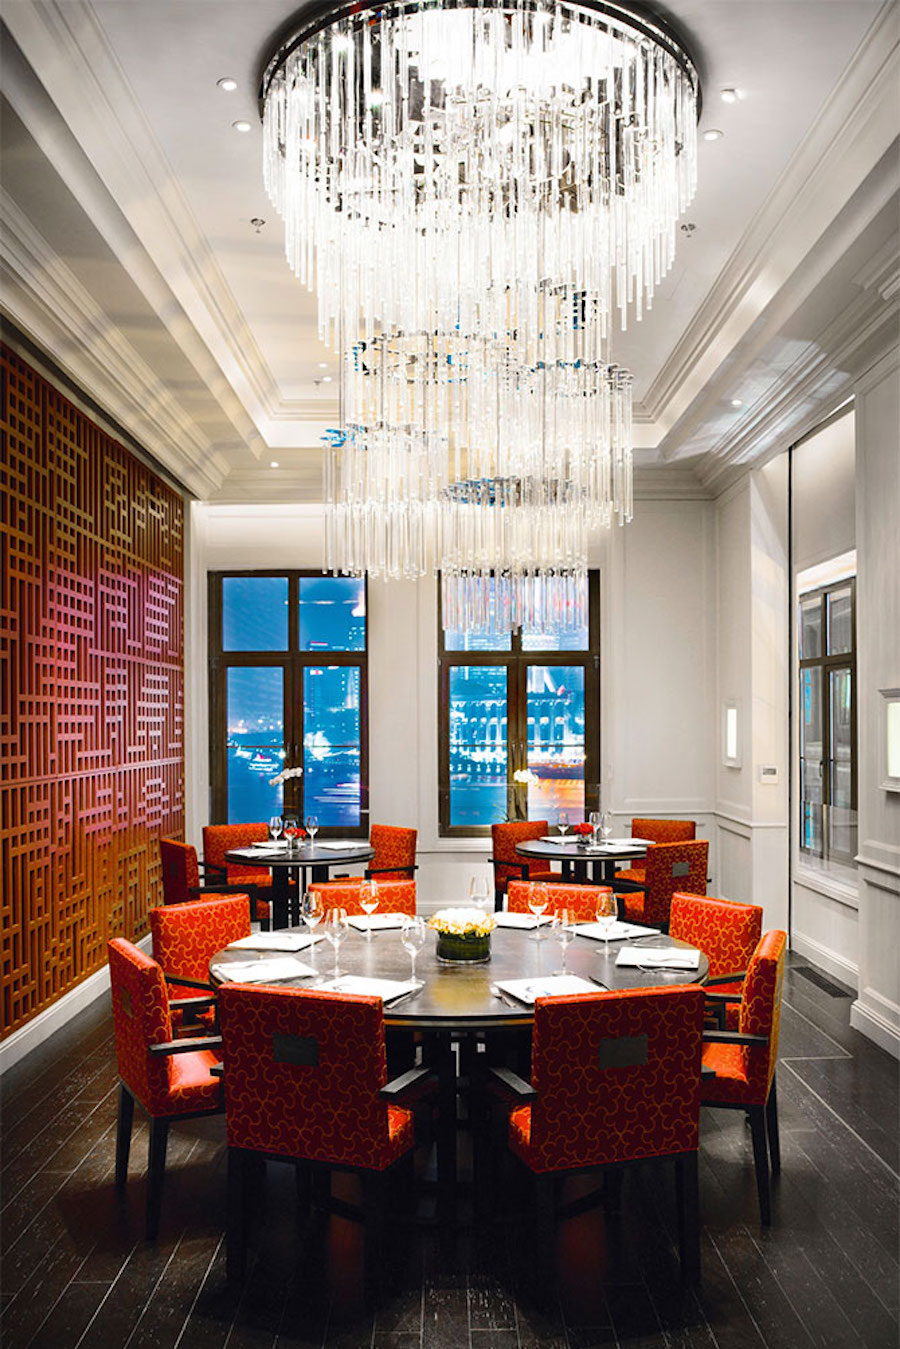 albergo-lusso-per-artisti-shanghai-swatch-art-peace-hotel-12